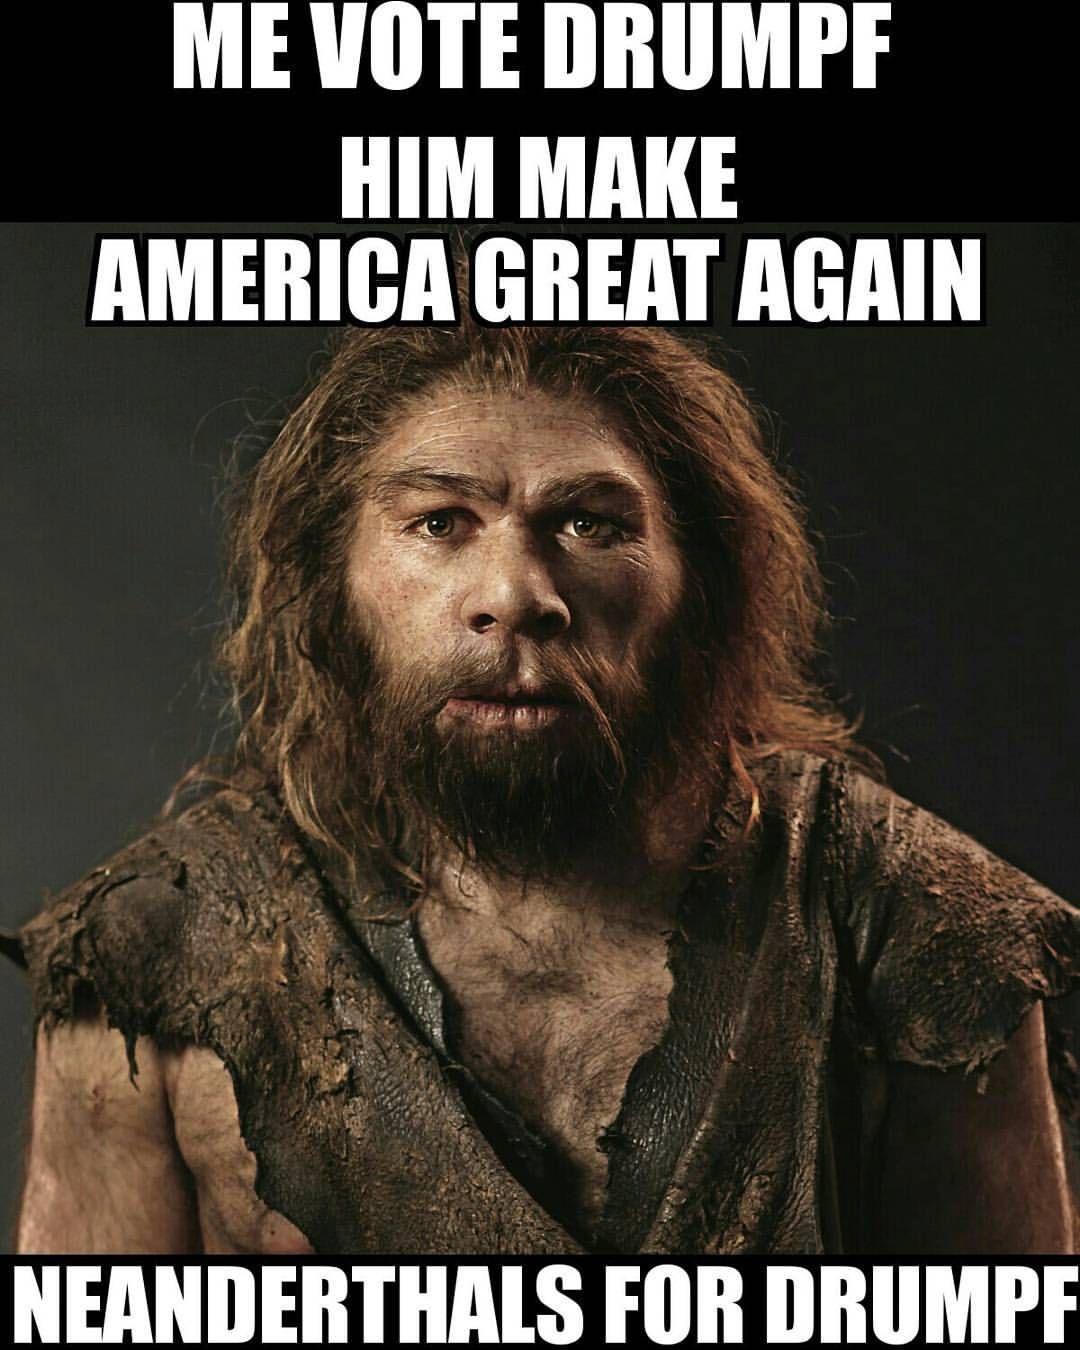 Me Vote Drumpf. HIM MAKE AMERICA GREAT AGAIN Neanderthals